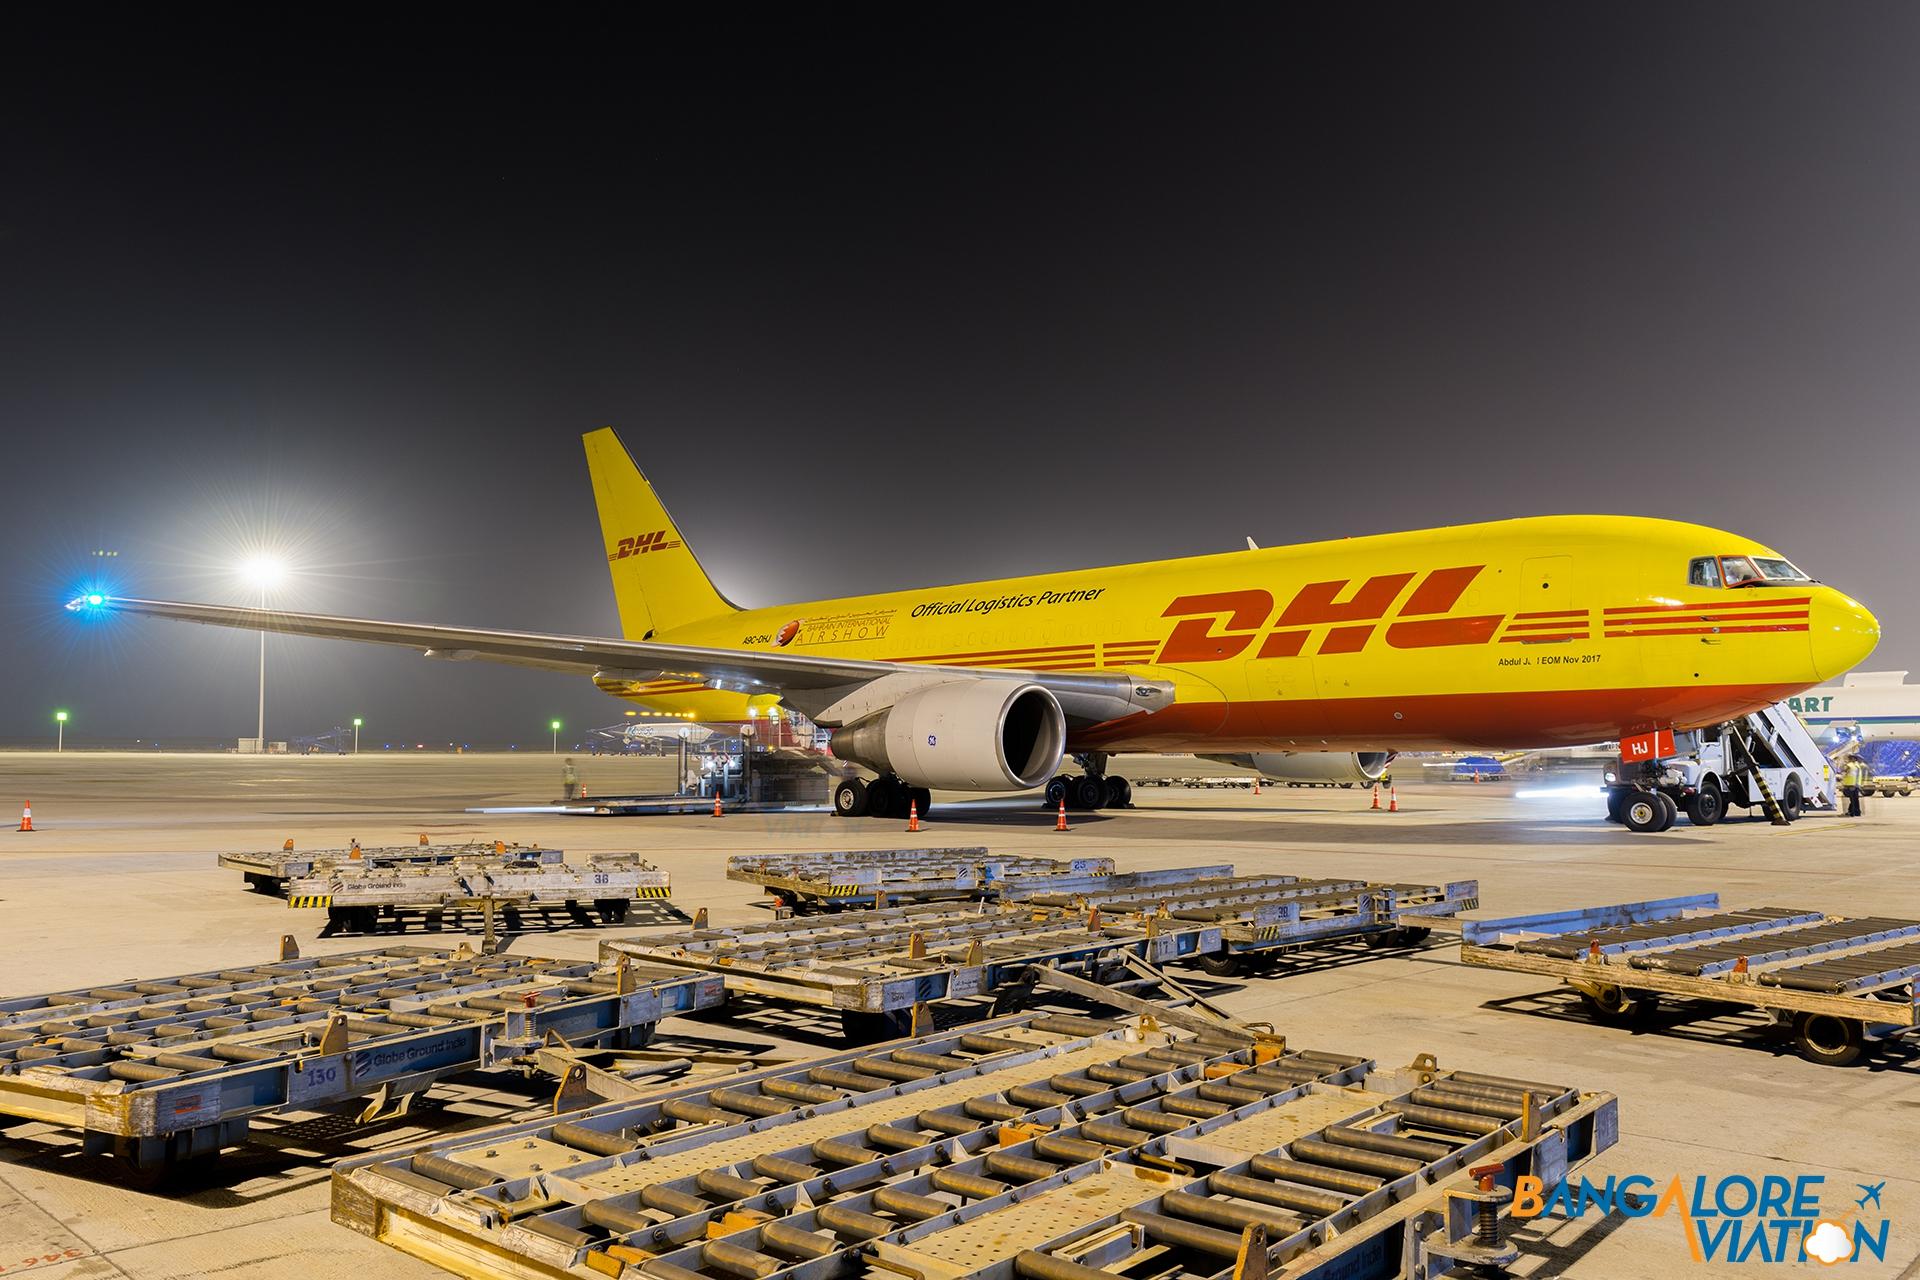 Photos: DHL Boeing 767 at Bangalore Airport – Bangalore Aviation